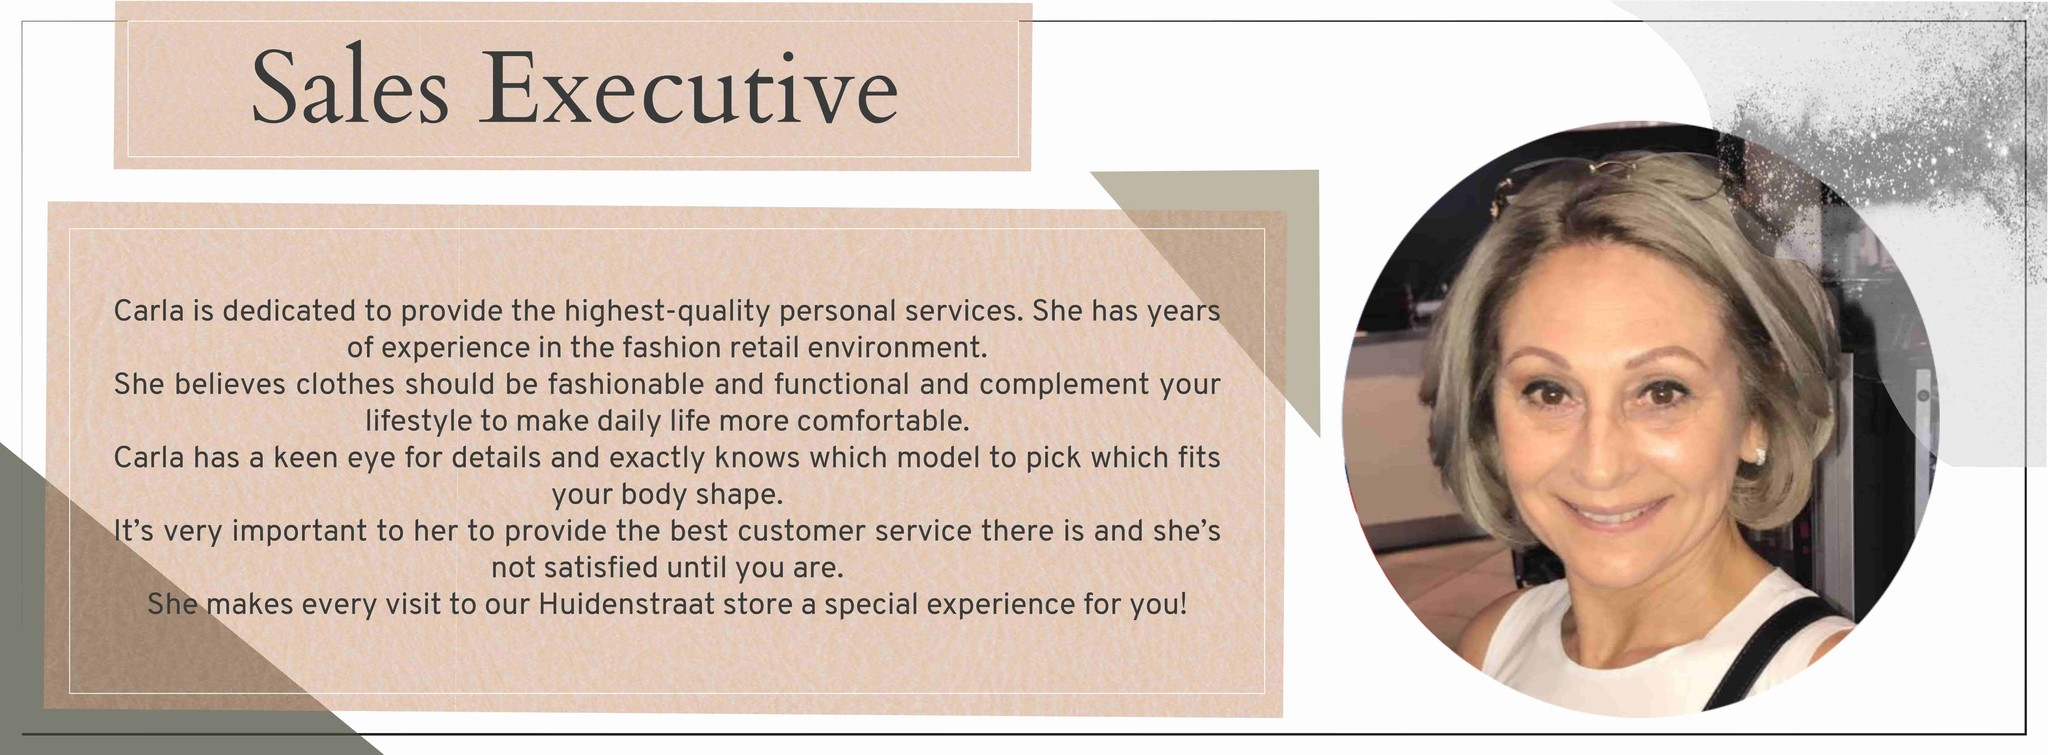 Carla sales executive